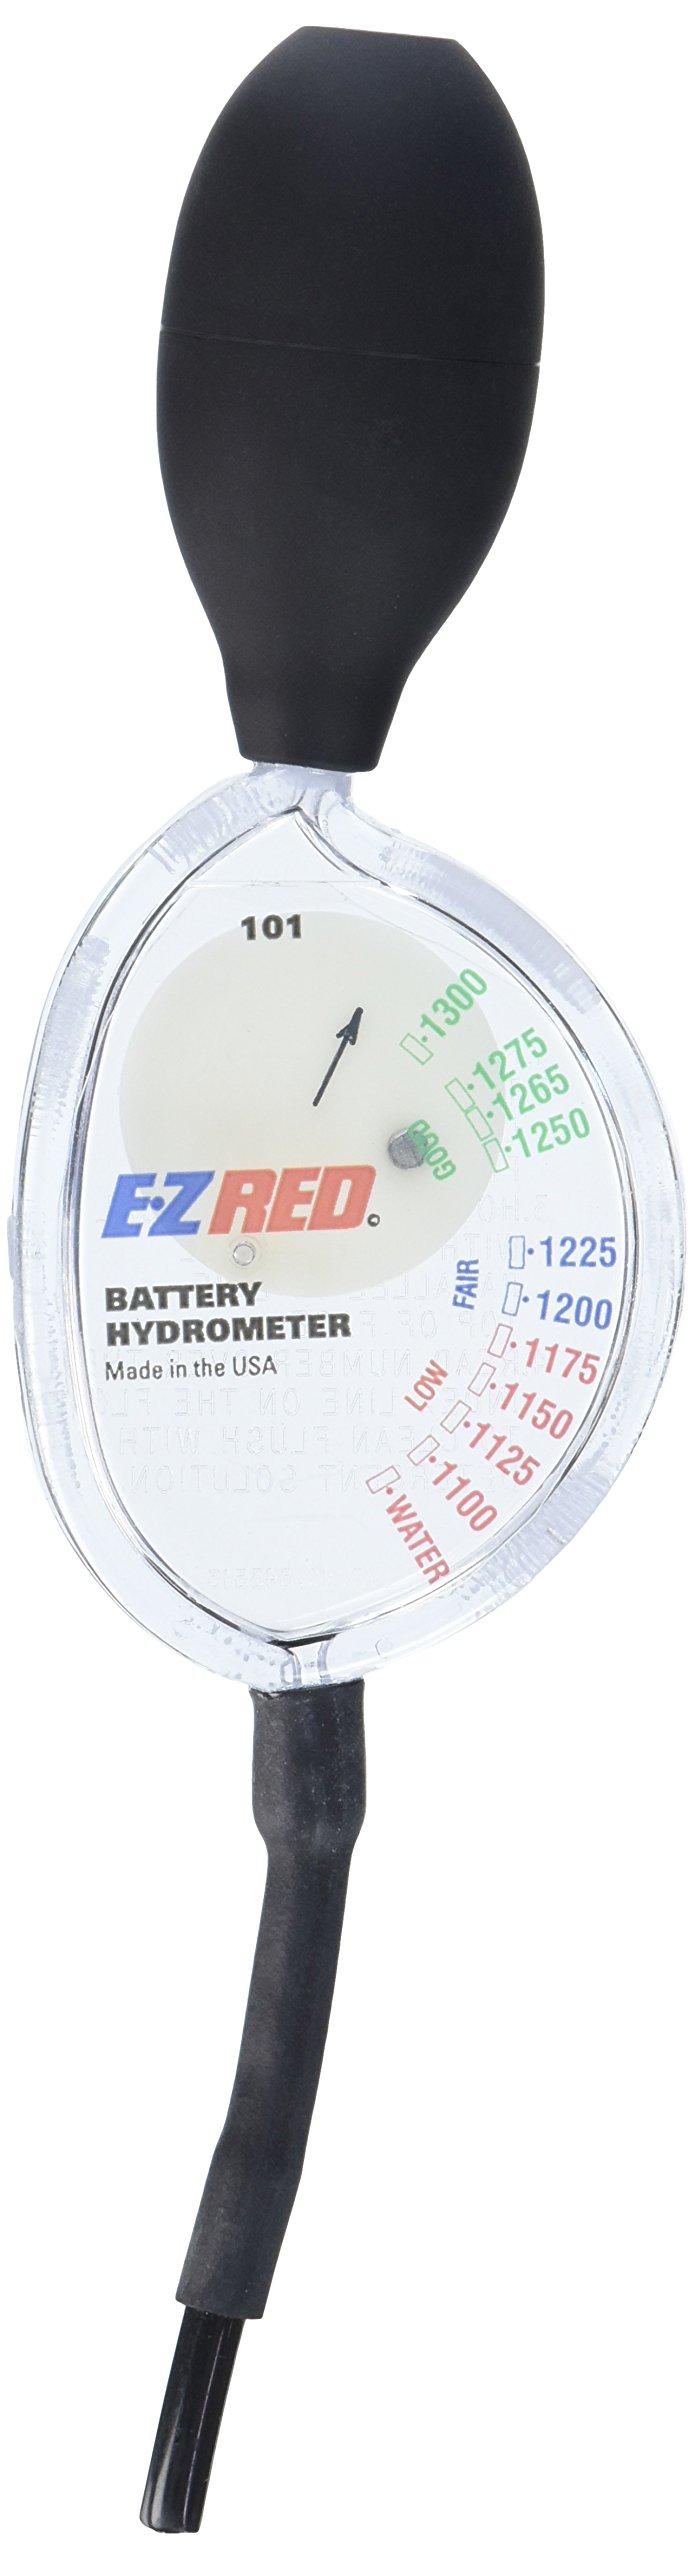 EZRED SP101 Battery Hydrometer